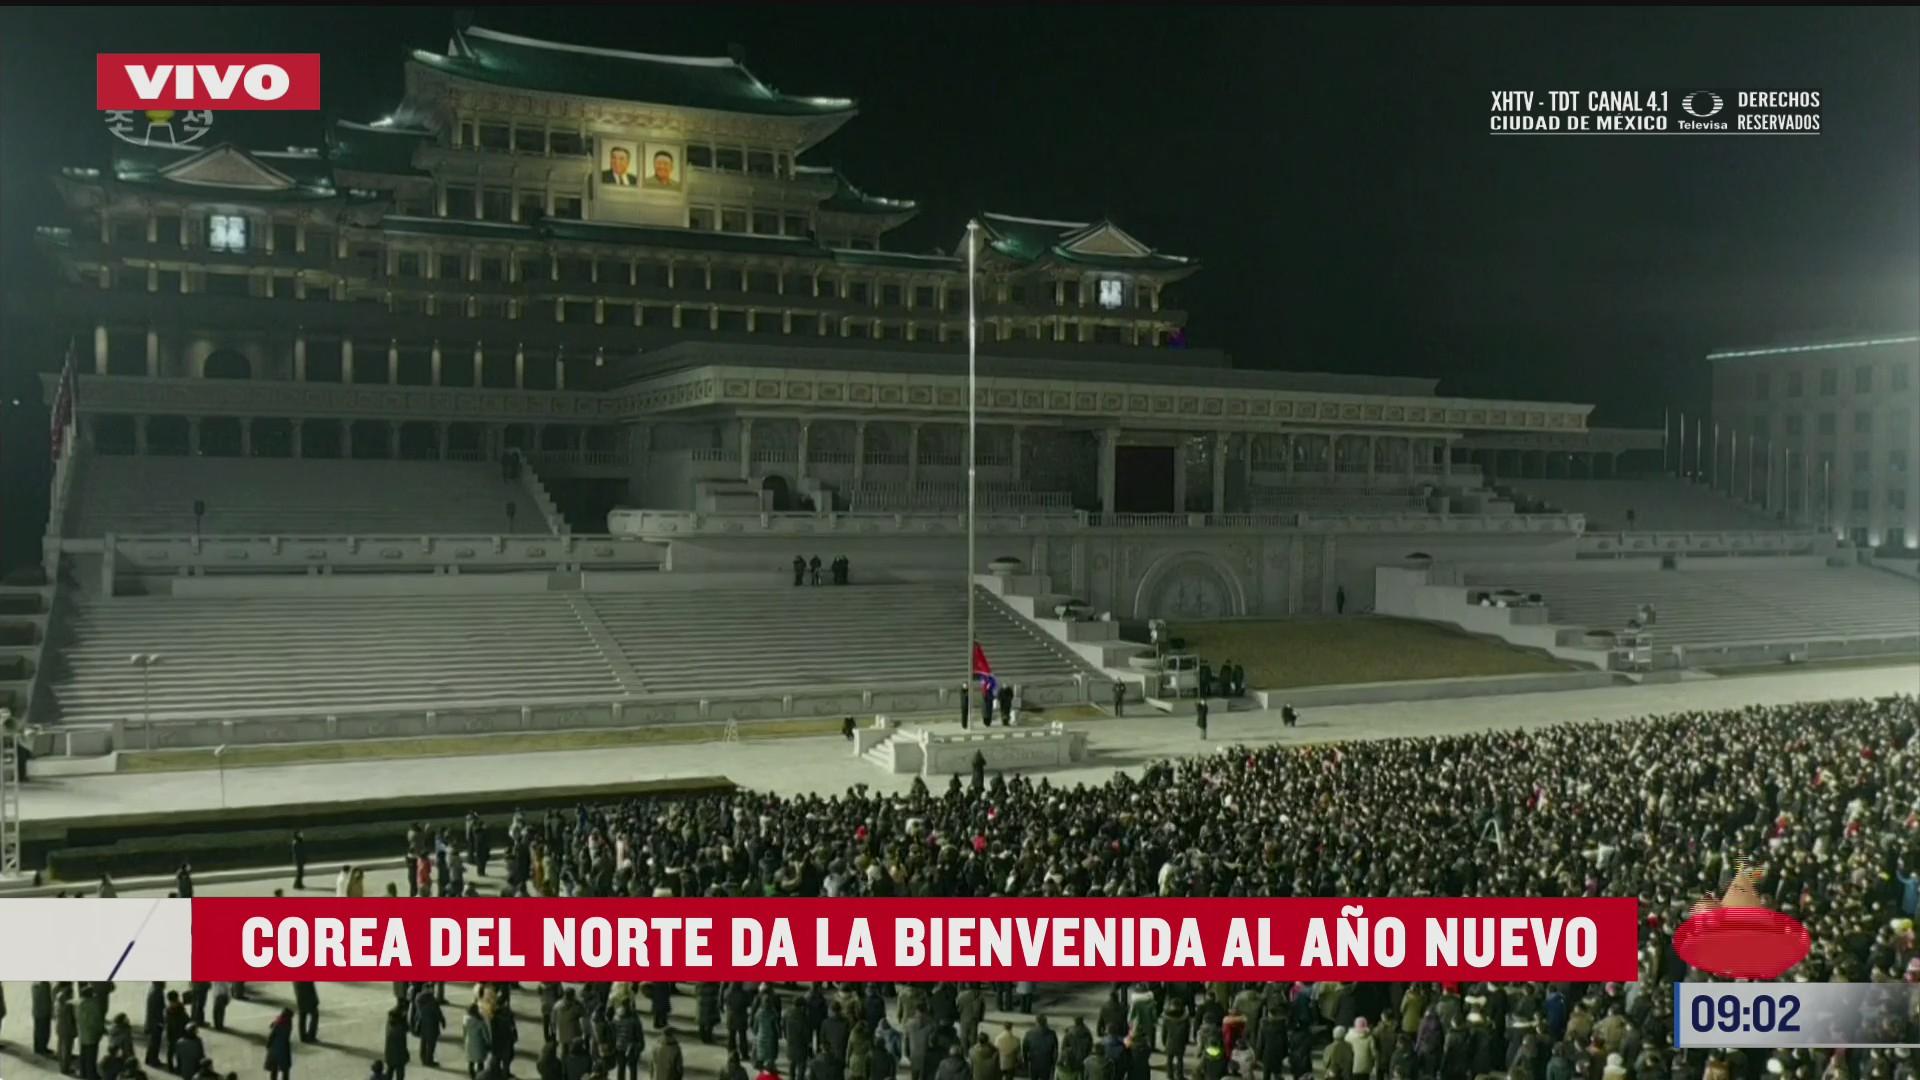 corea del norte da la bienvenida al ano nuevo